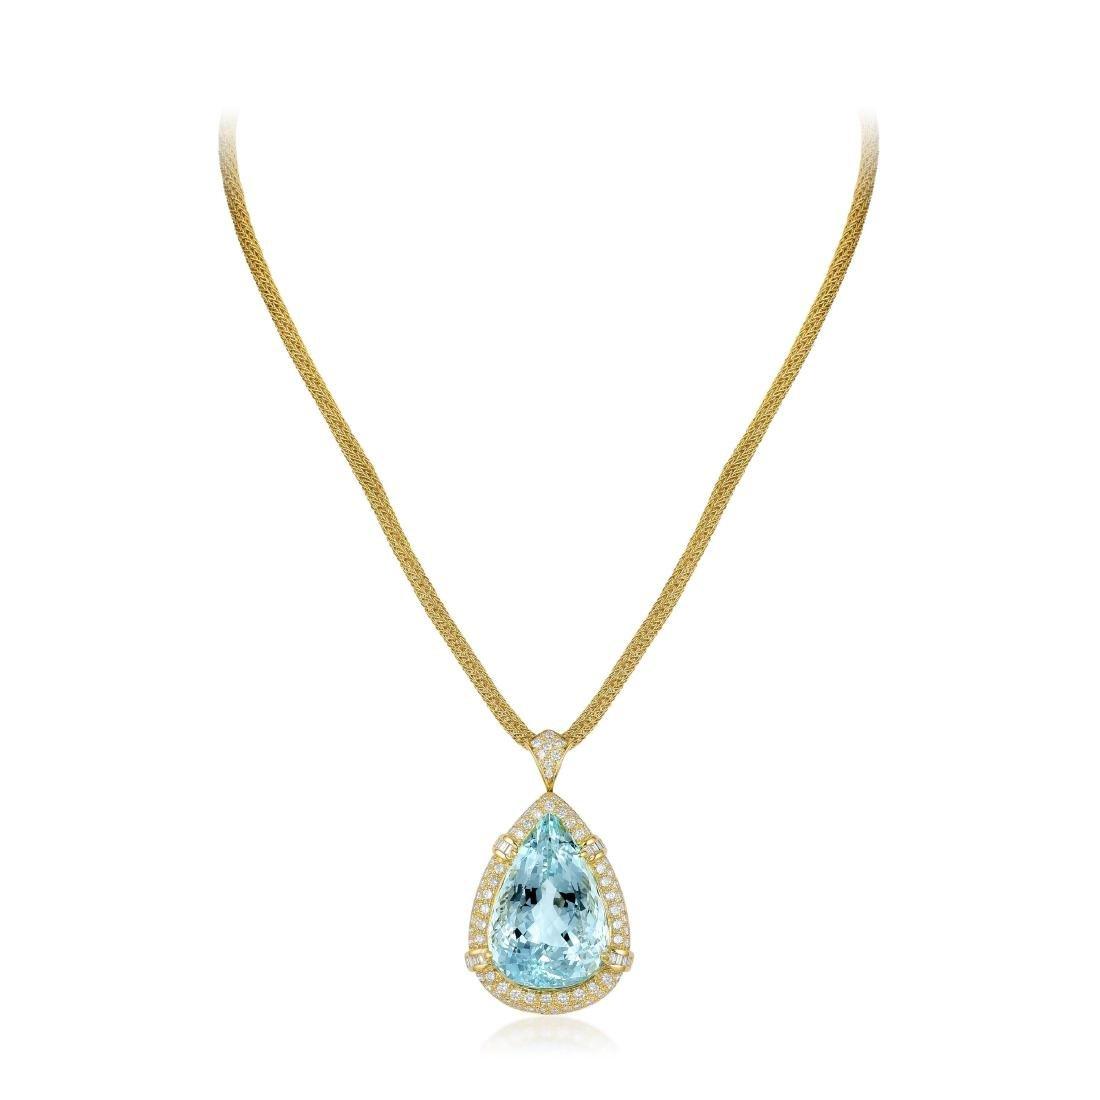 An Aquamarine and Diamond Pendant/Brooch Necklace